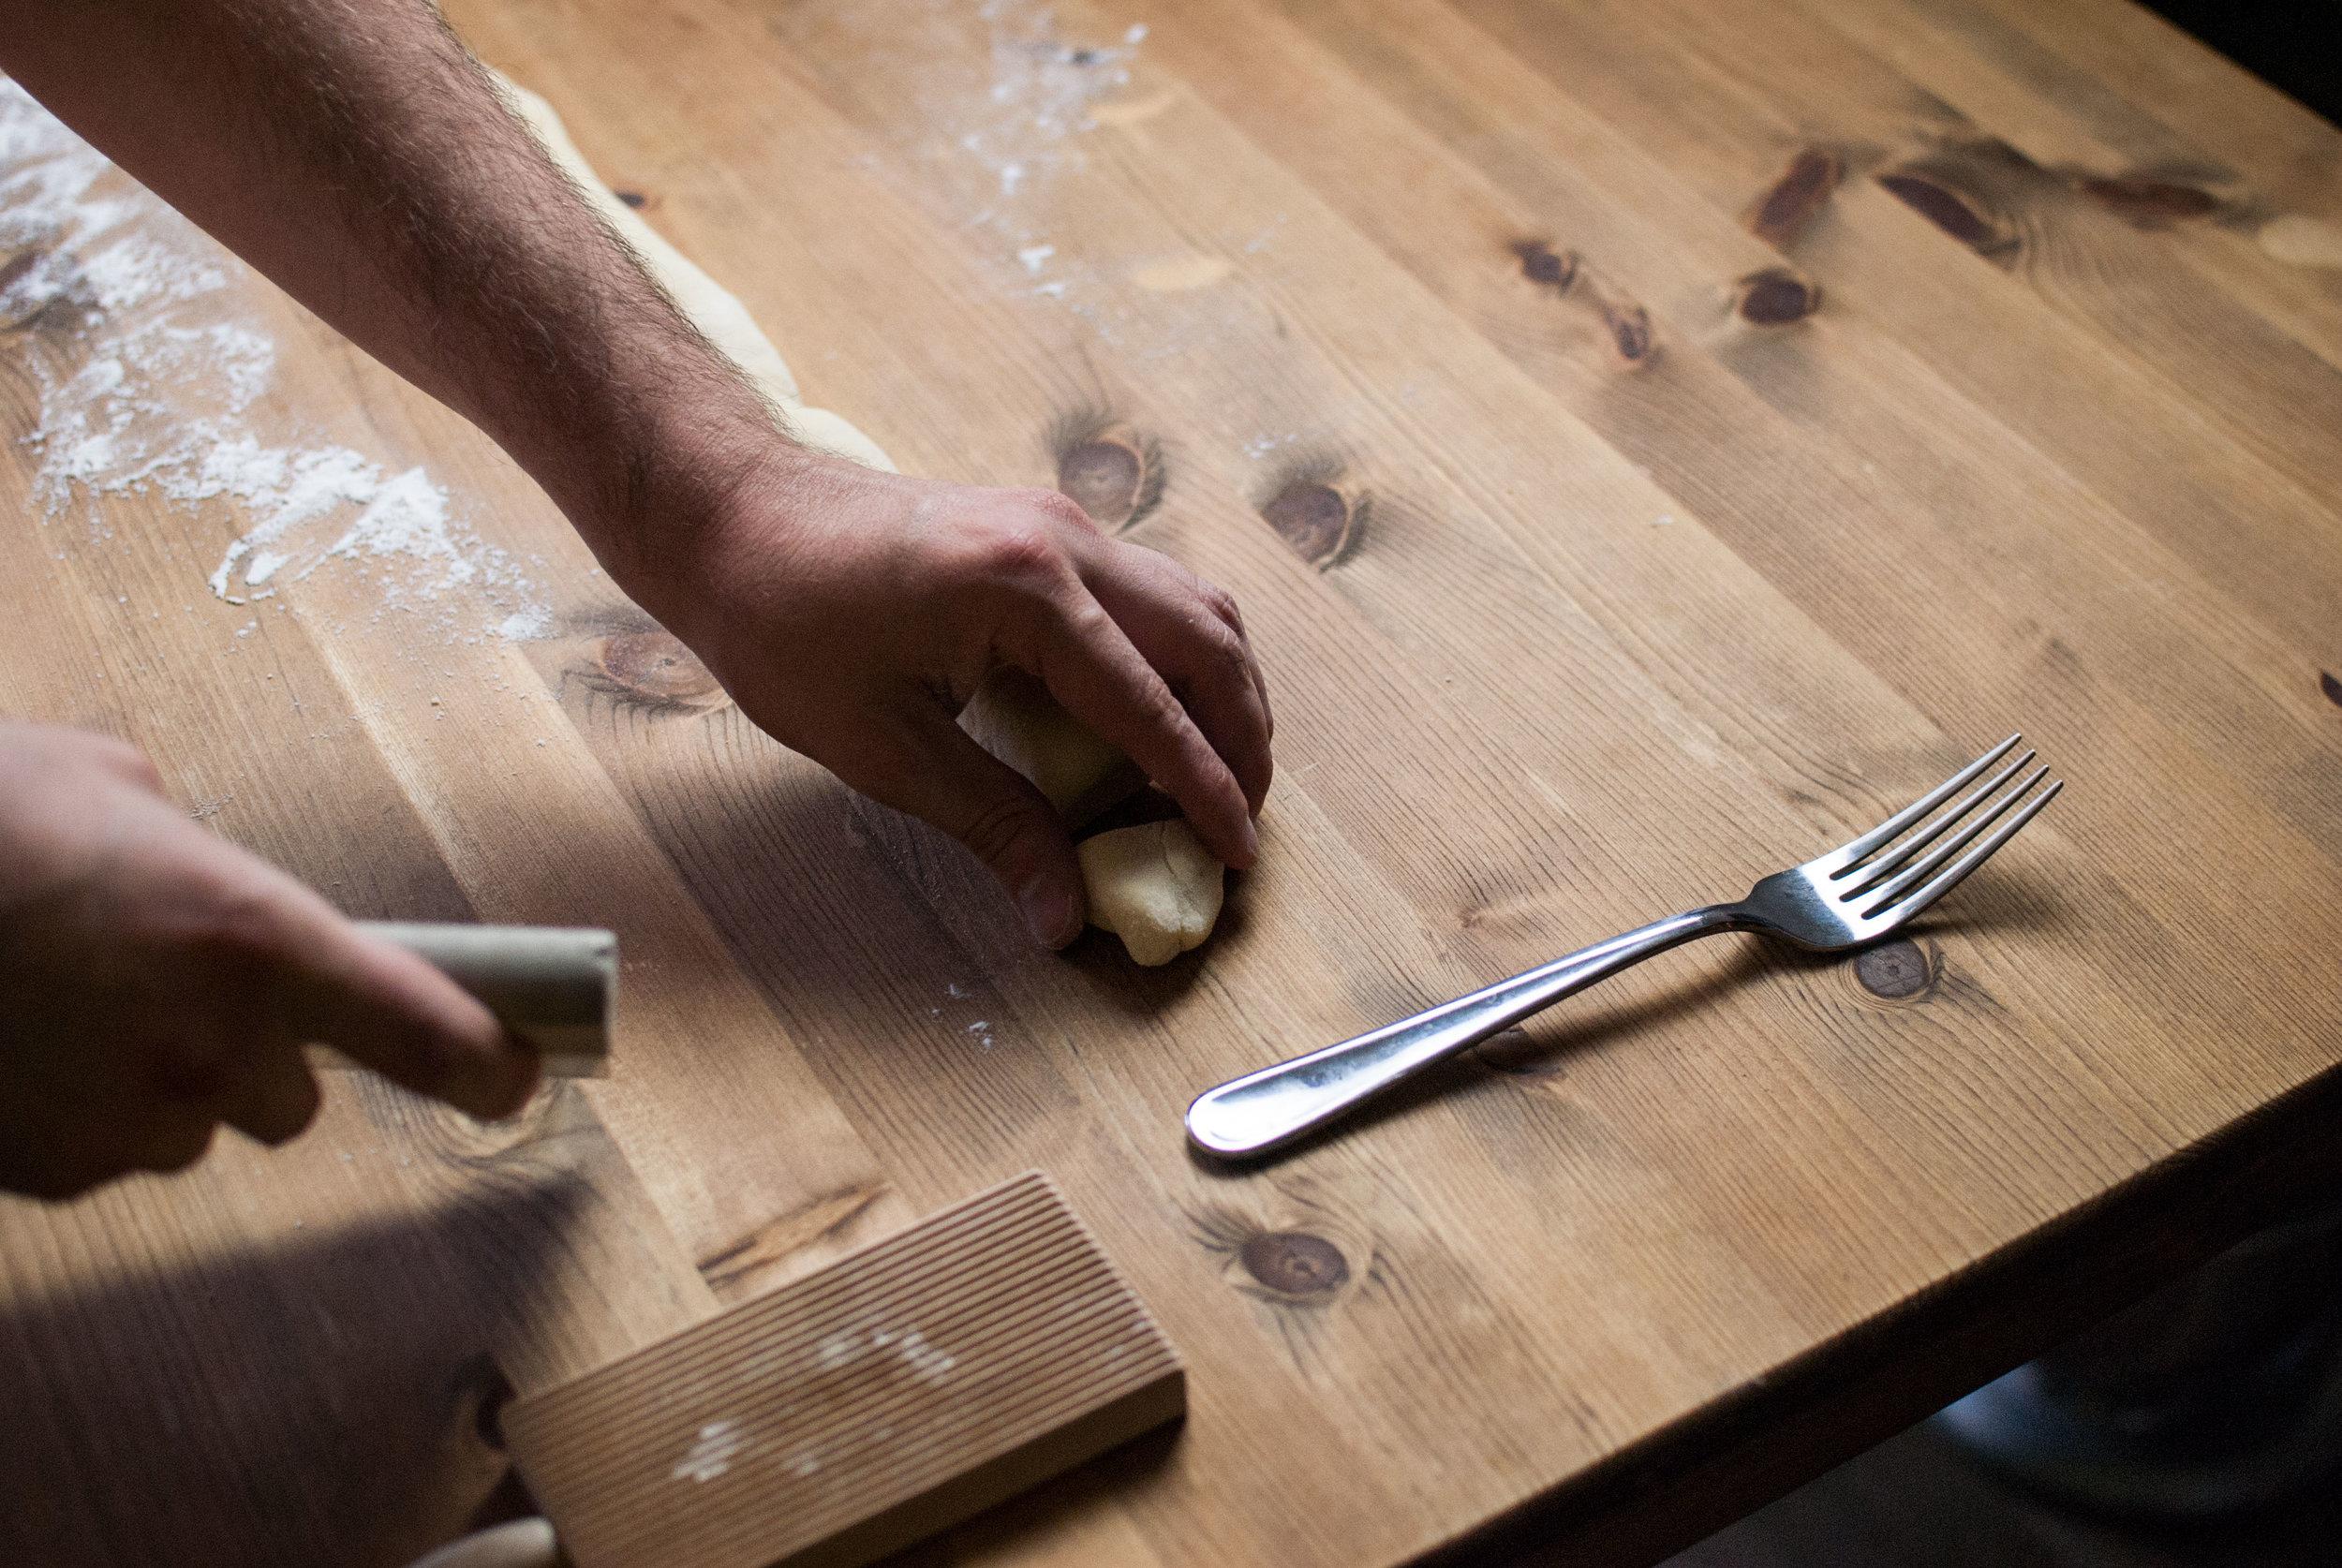 gnocchi_dough_12.jpg